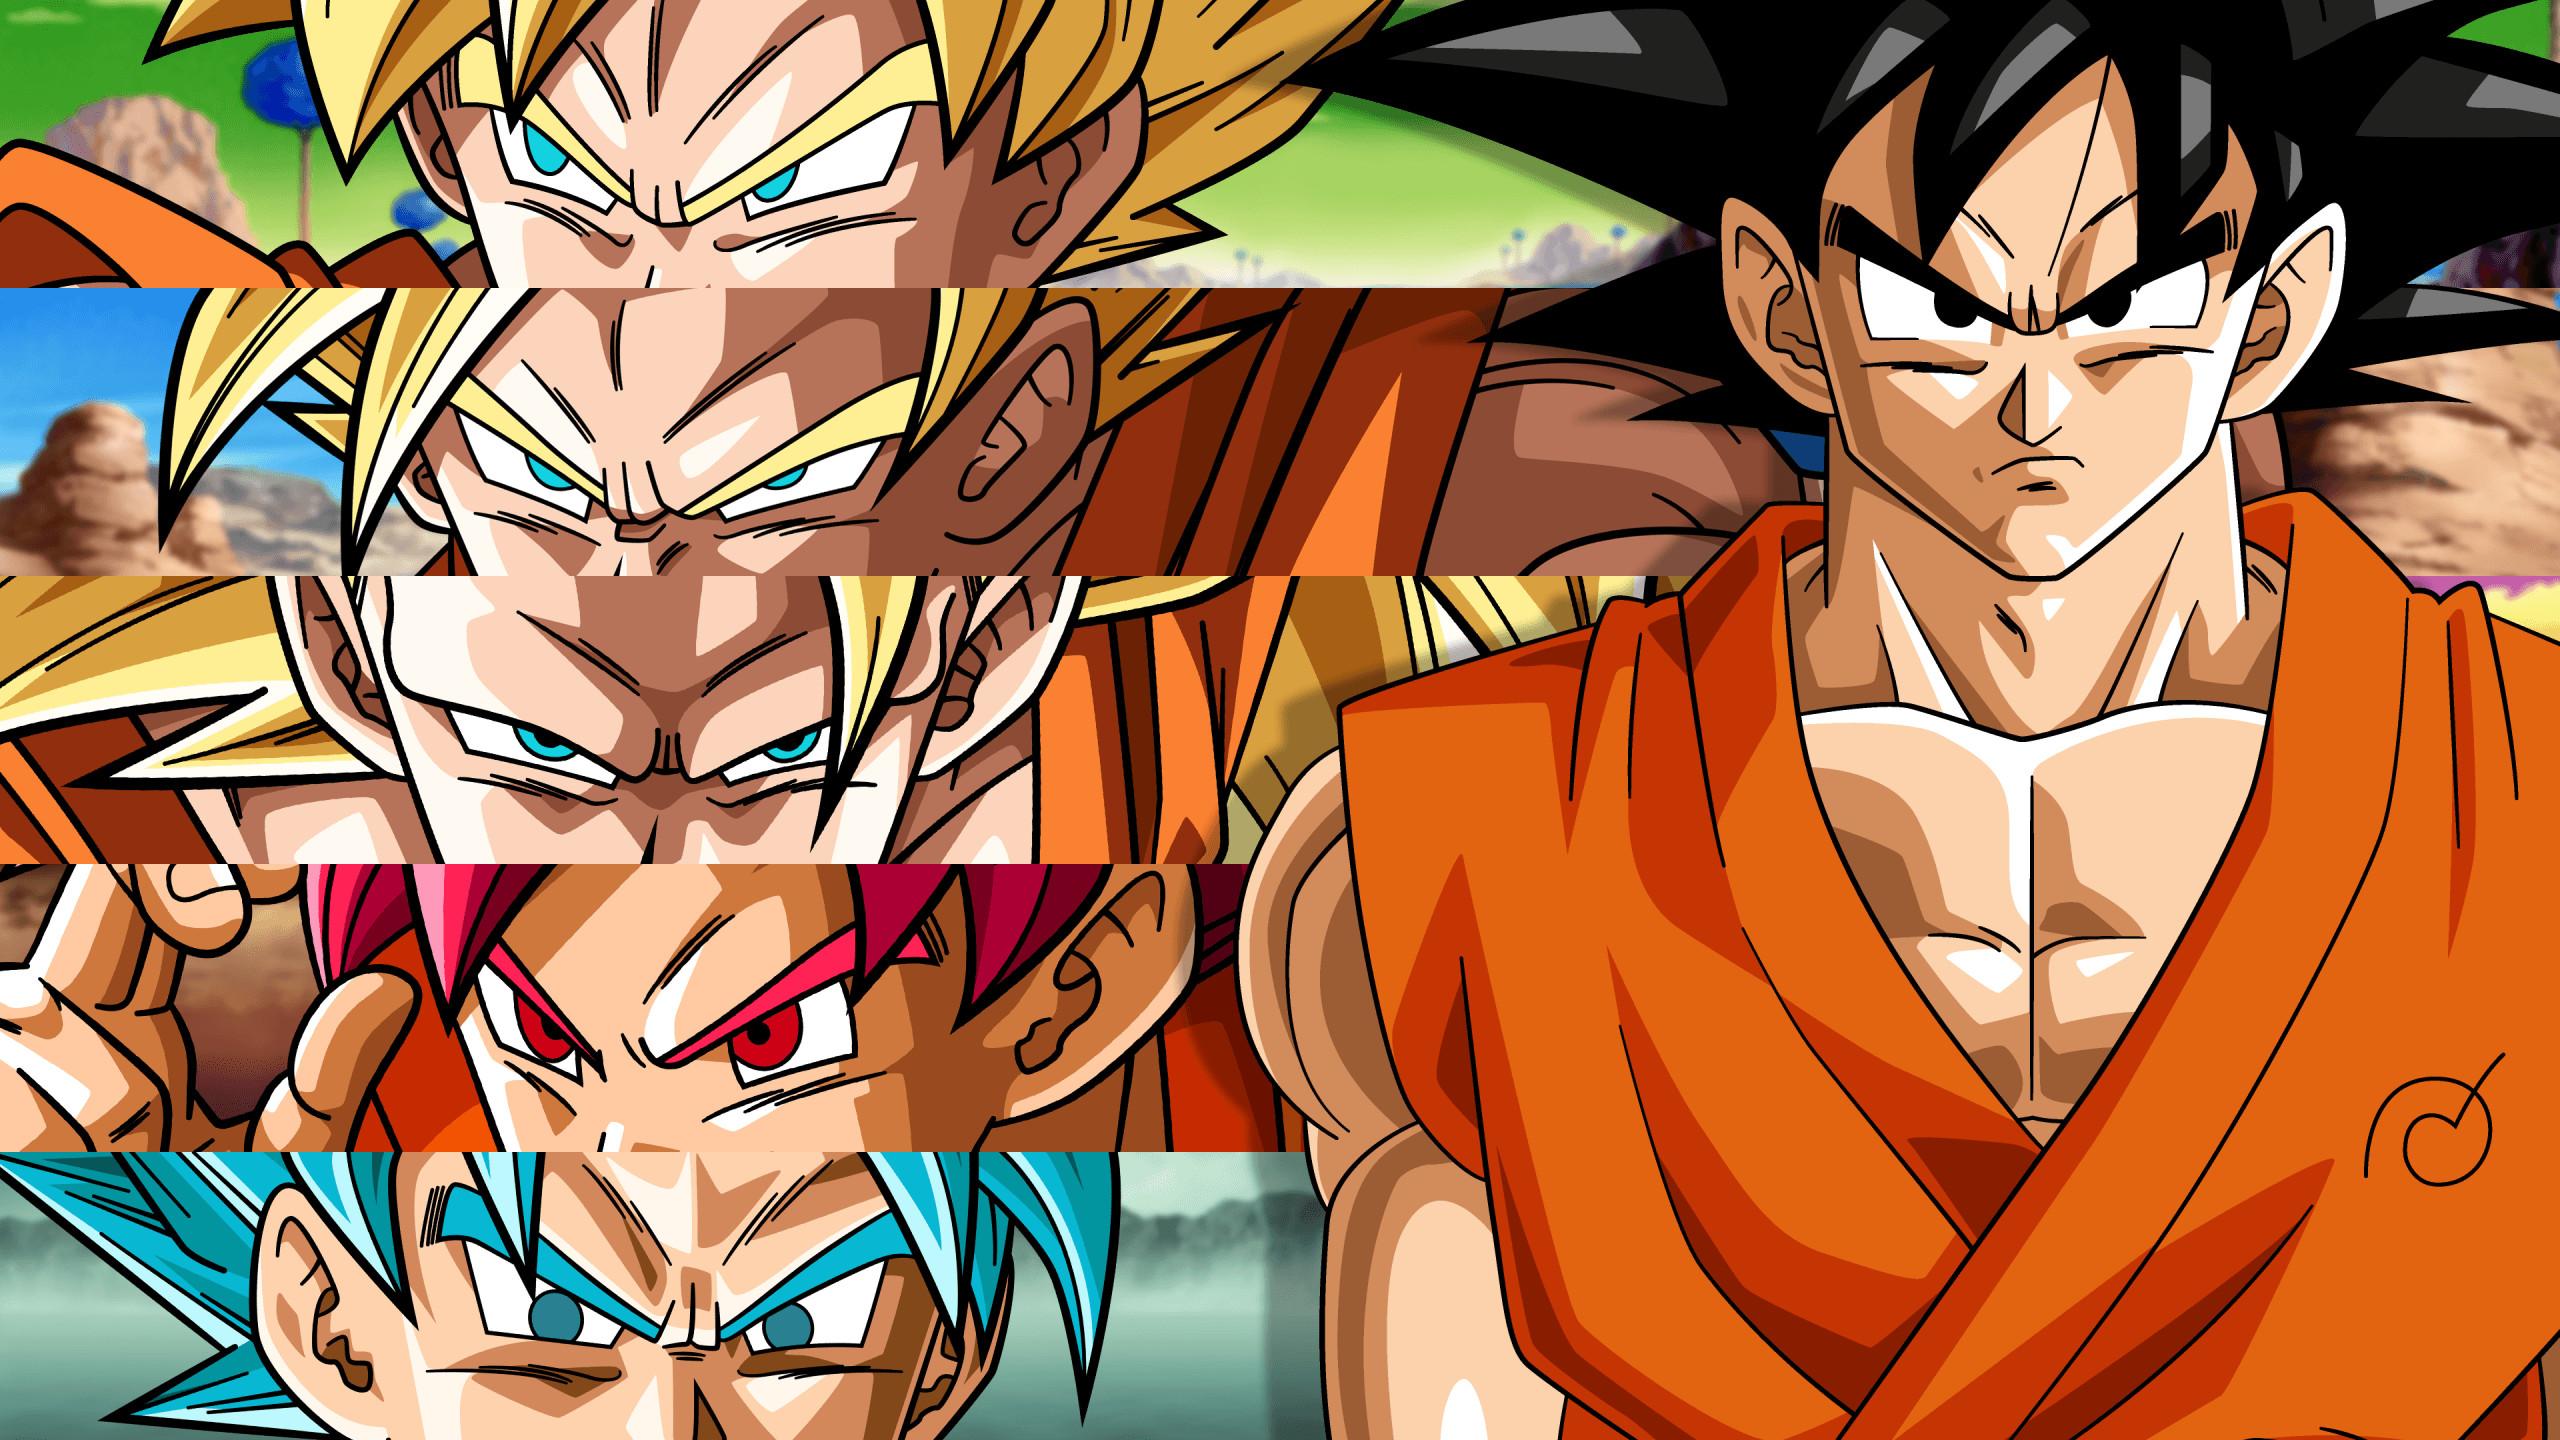 Black Goku, Vegeta Dragon Ball Super Wallpaper HD